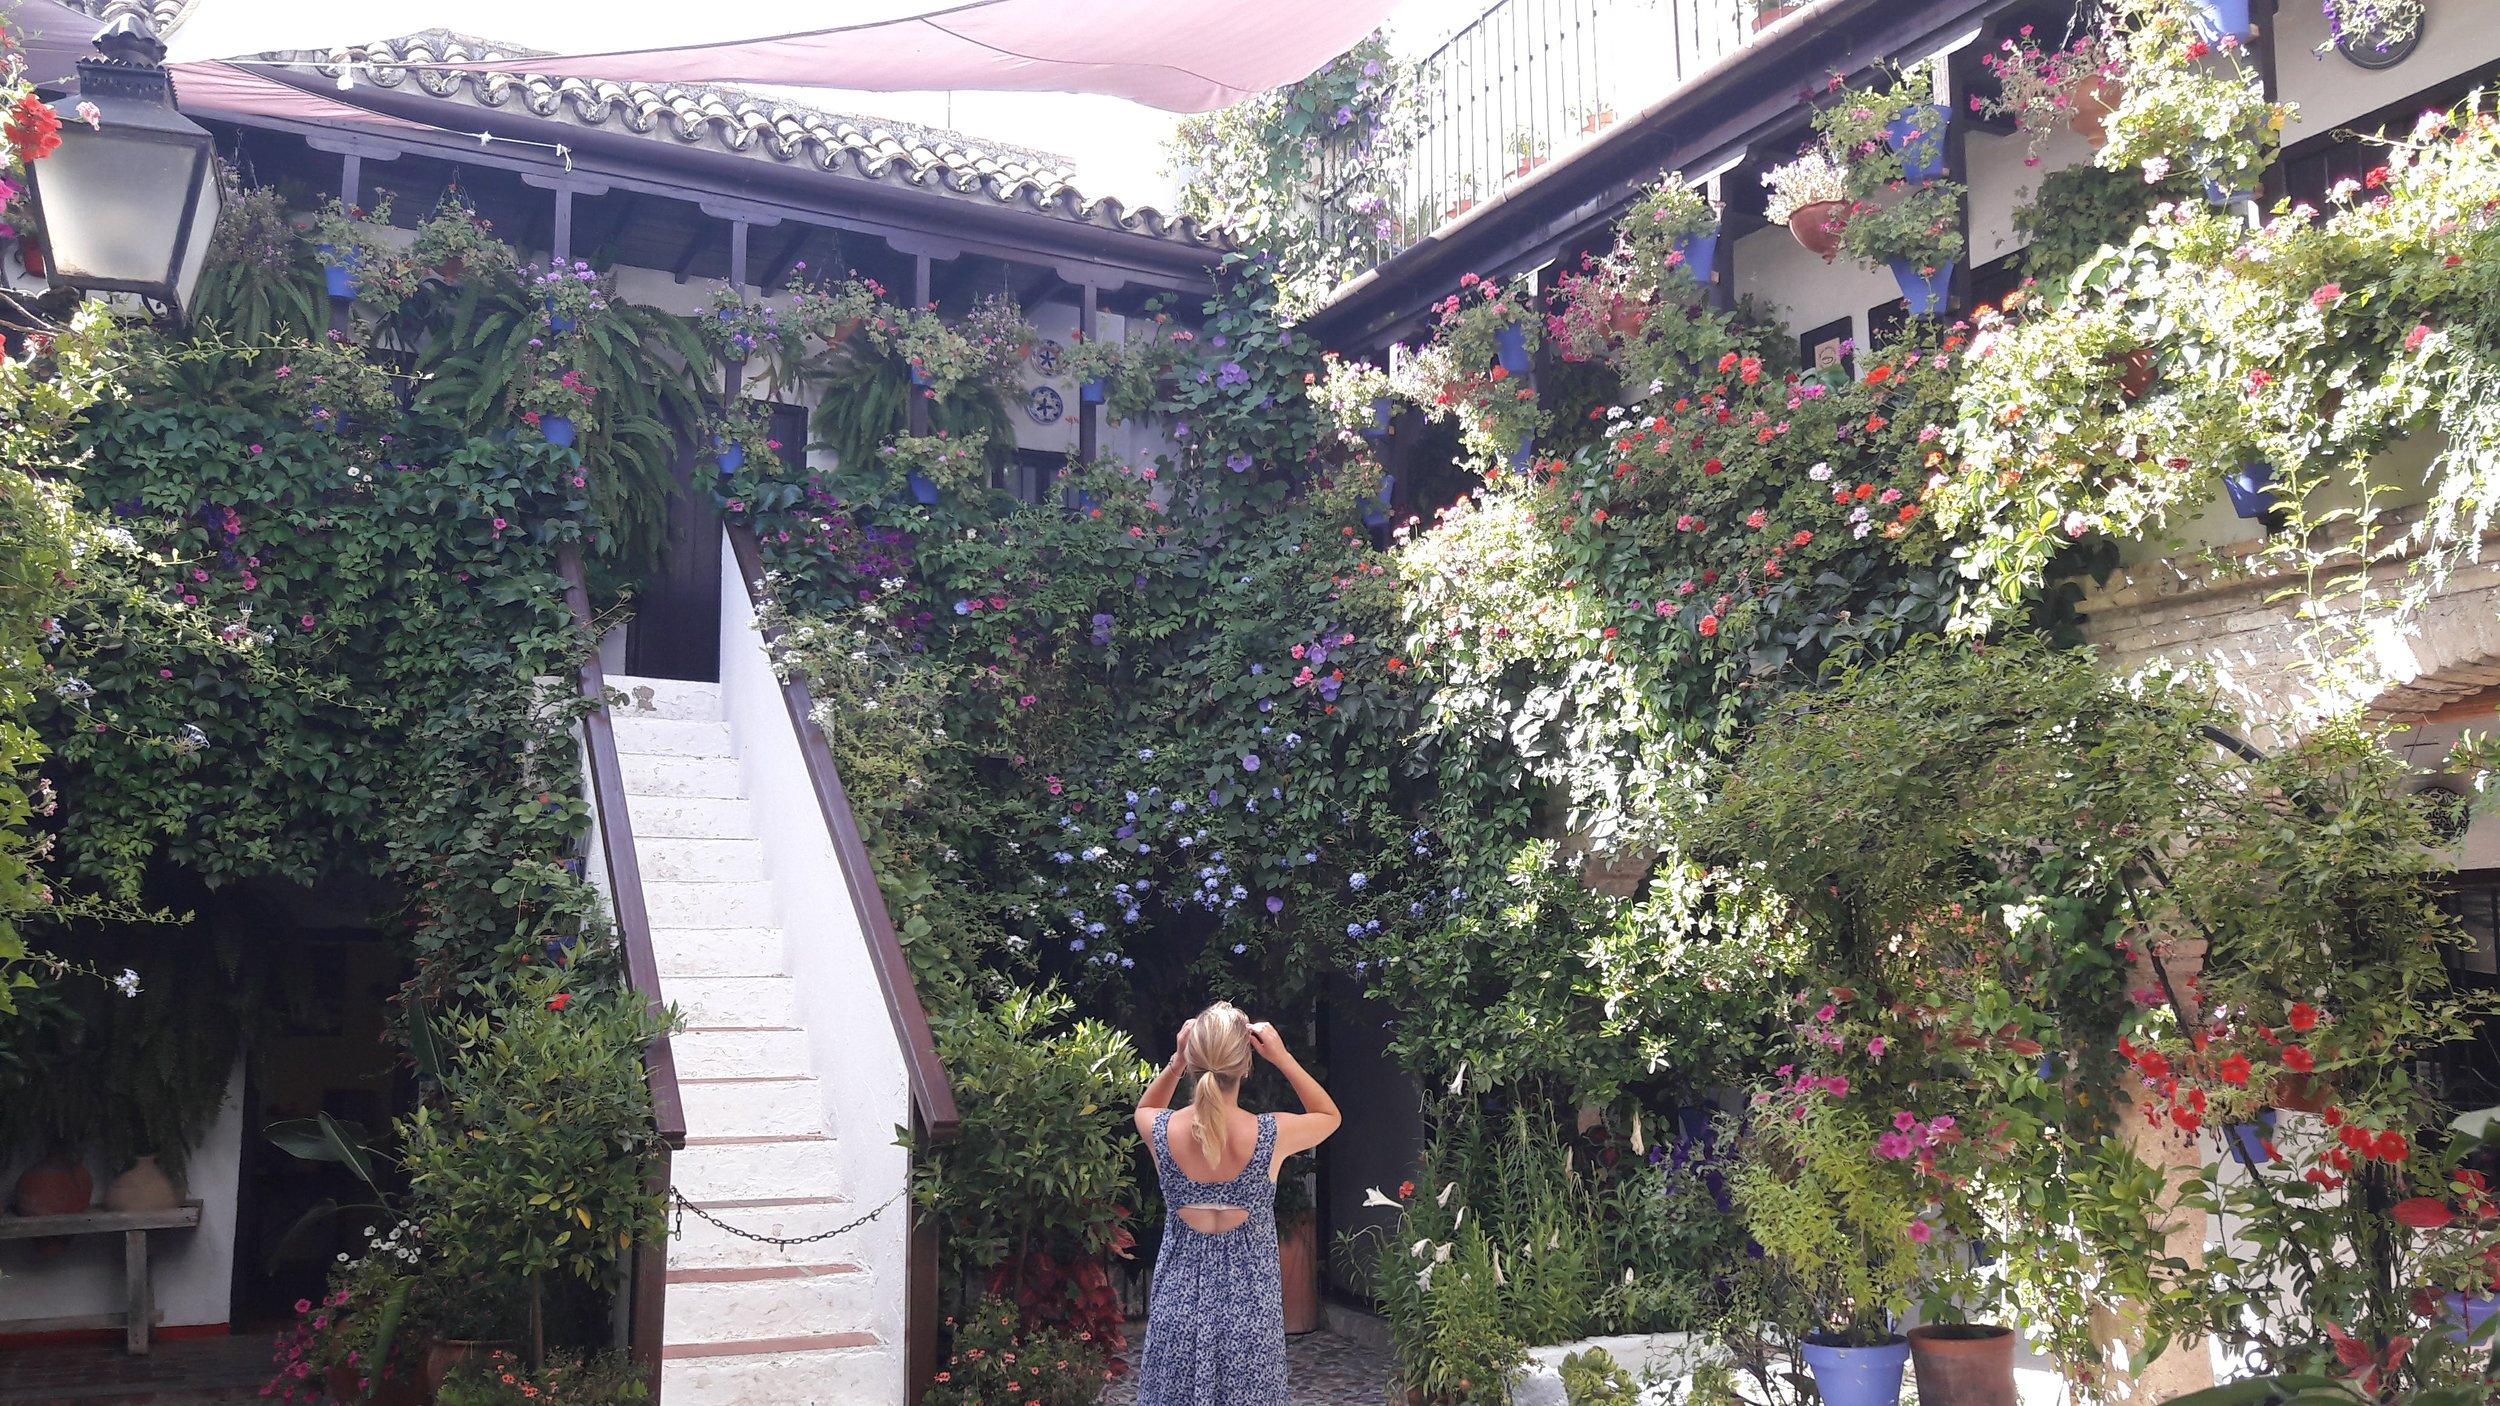 Gardens of Cordoba - What do you bring me?